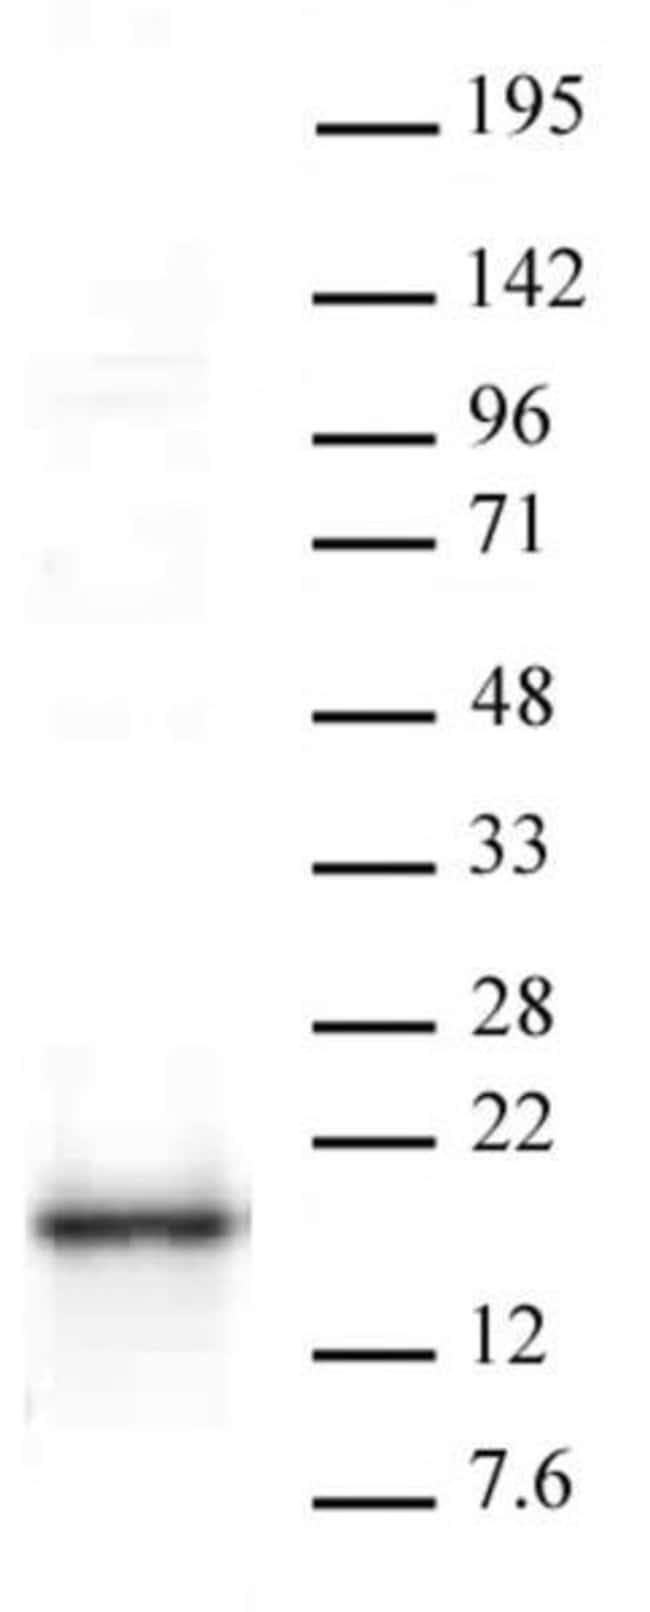 HMGA1 Rabbit anti-Human, Unconjugated, Polyclonal, Active Motif:Antibodies:Primary